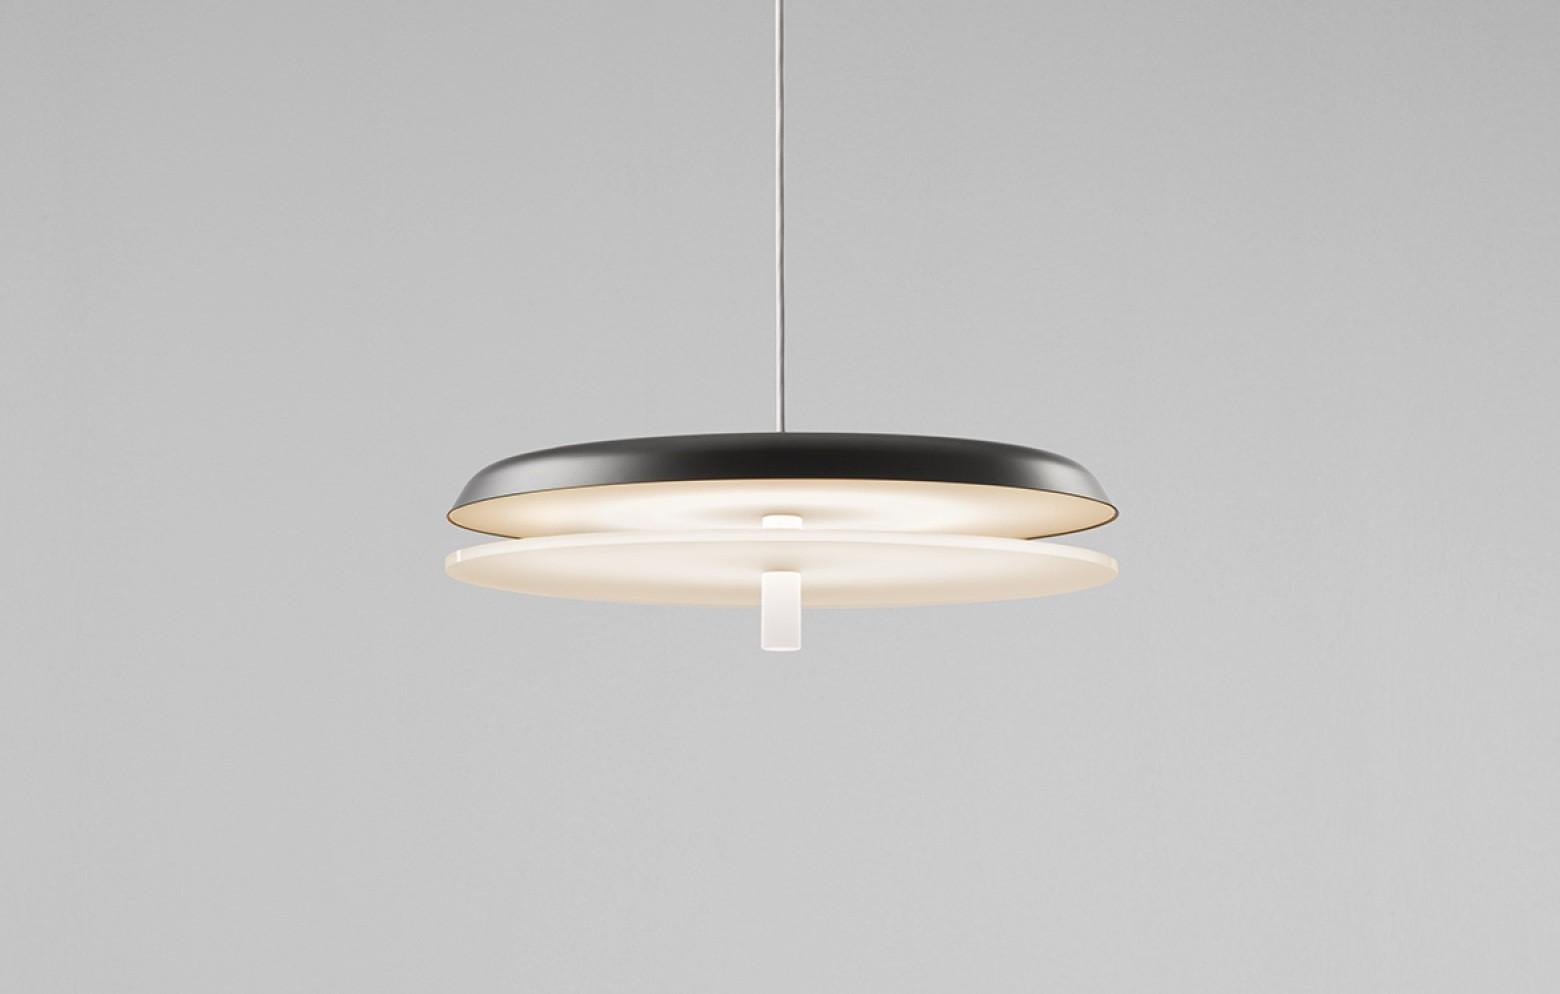 landing h ngelampe lampen kleinm bel accessoires who 39 s perfect. Black Bedroom Furniture Sets. Home Design Ideas